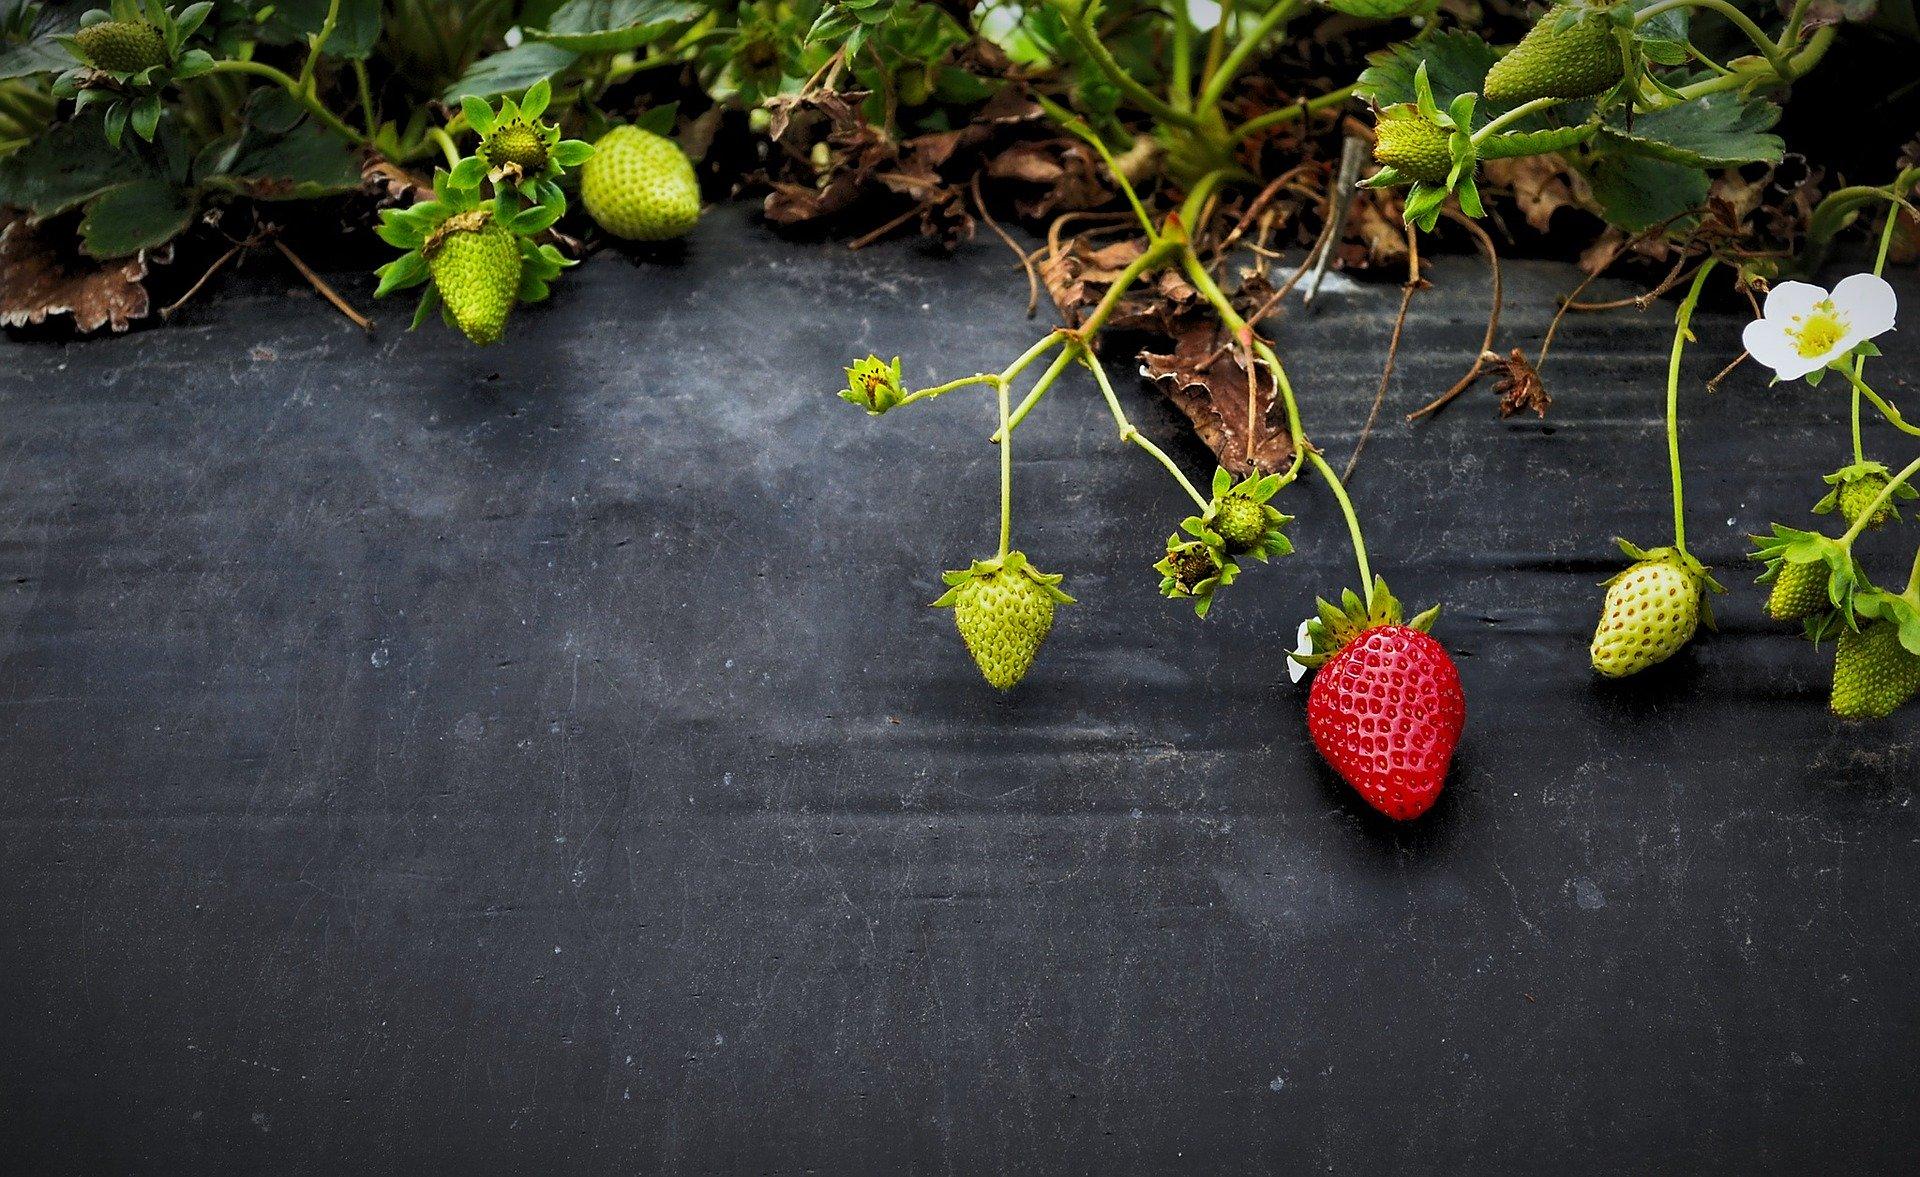 How to Make a Strawberry Barrel